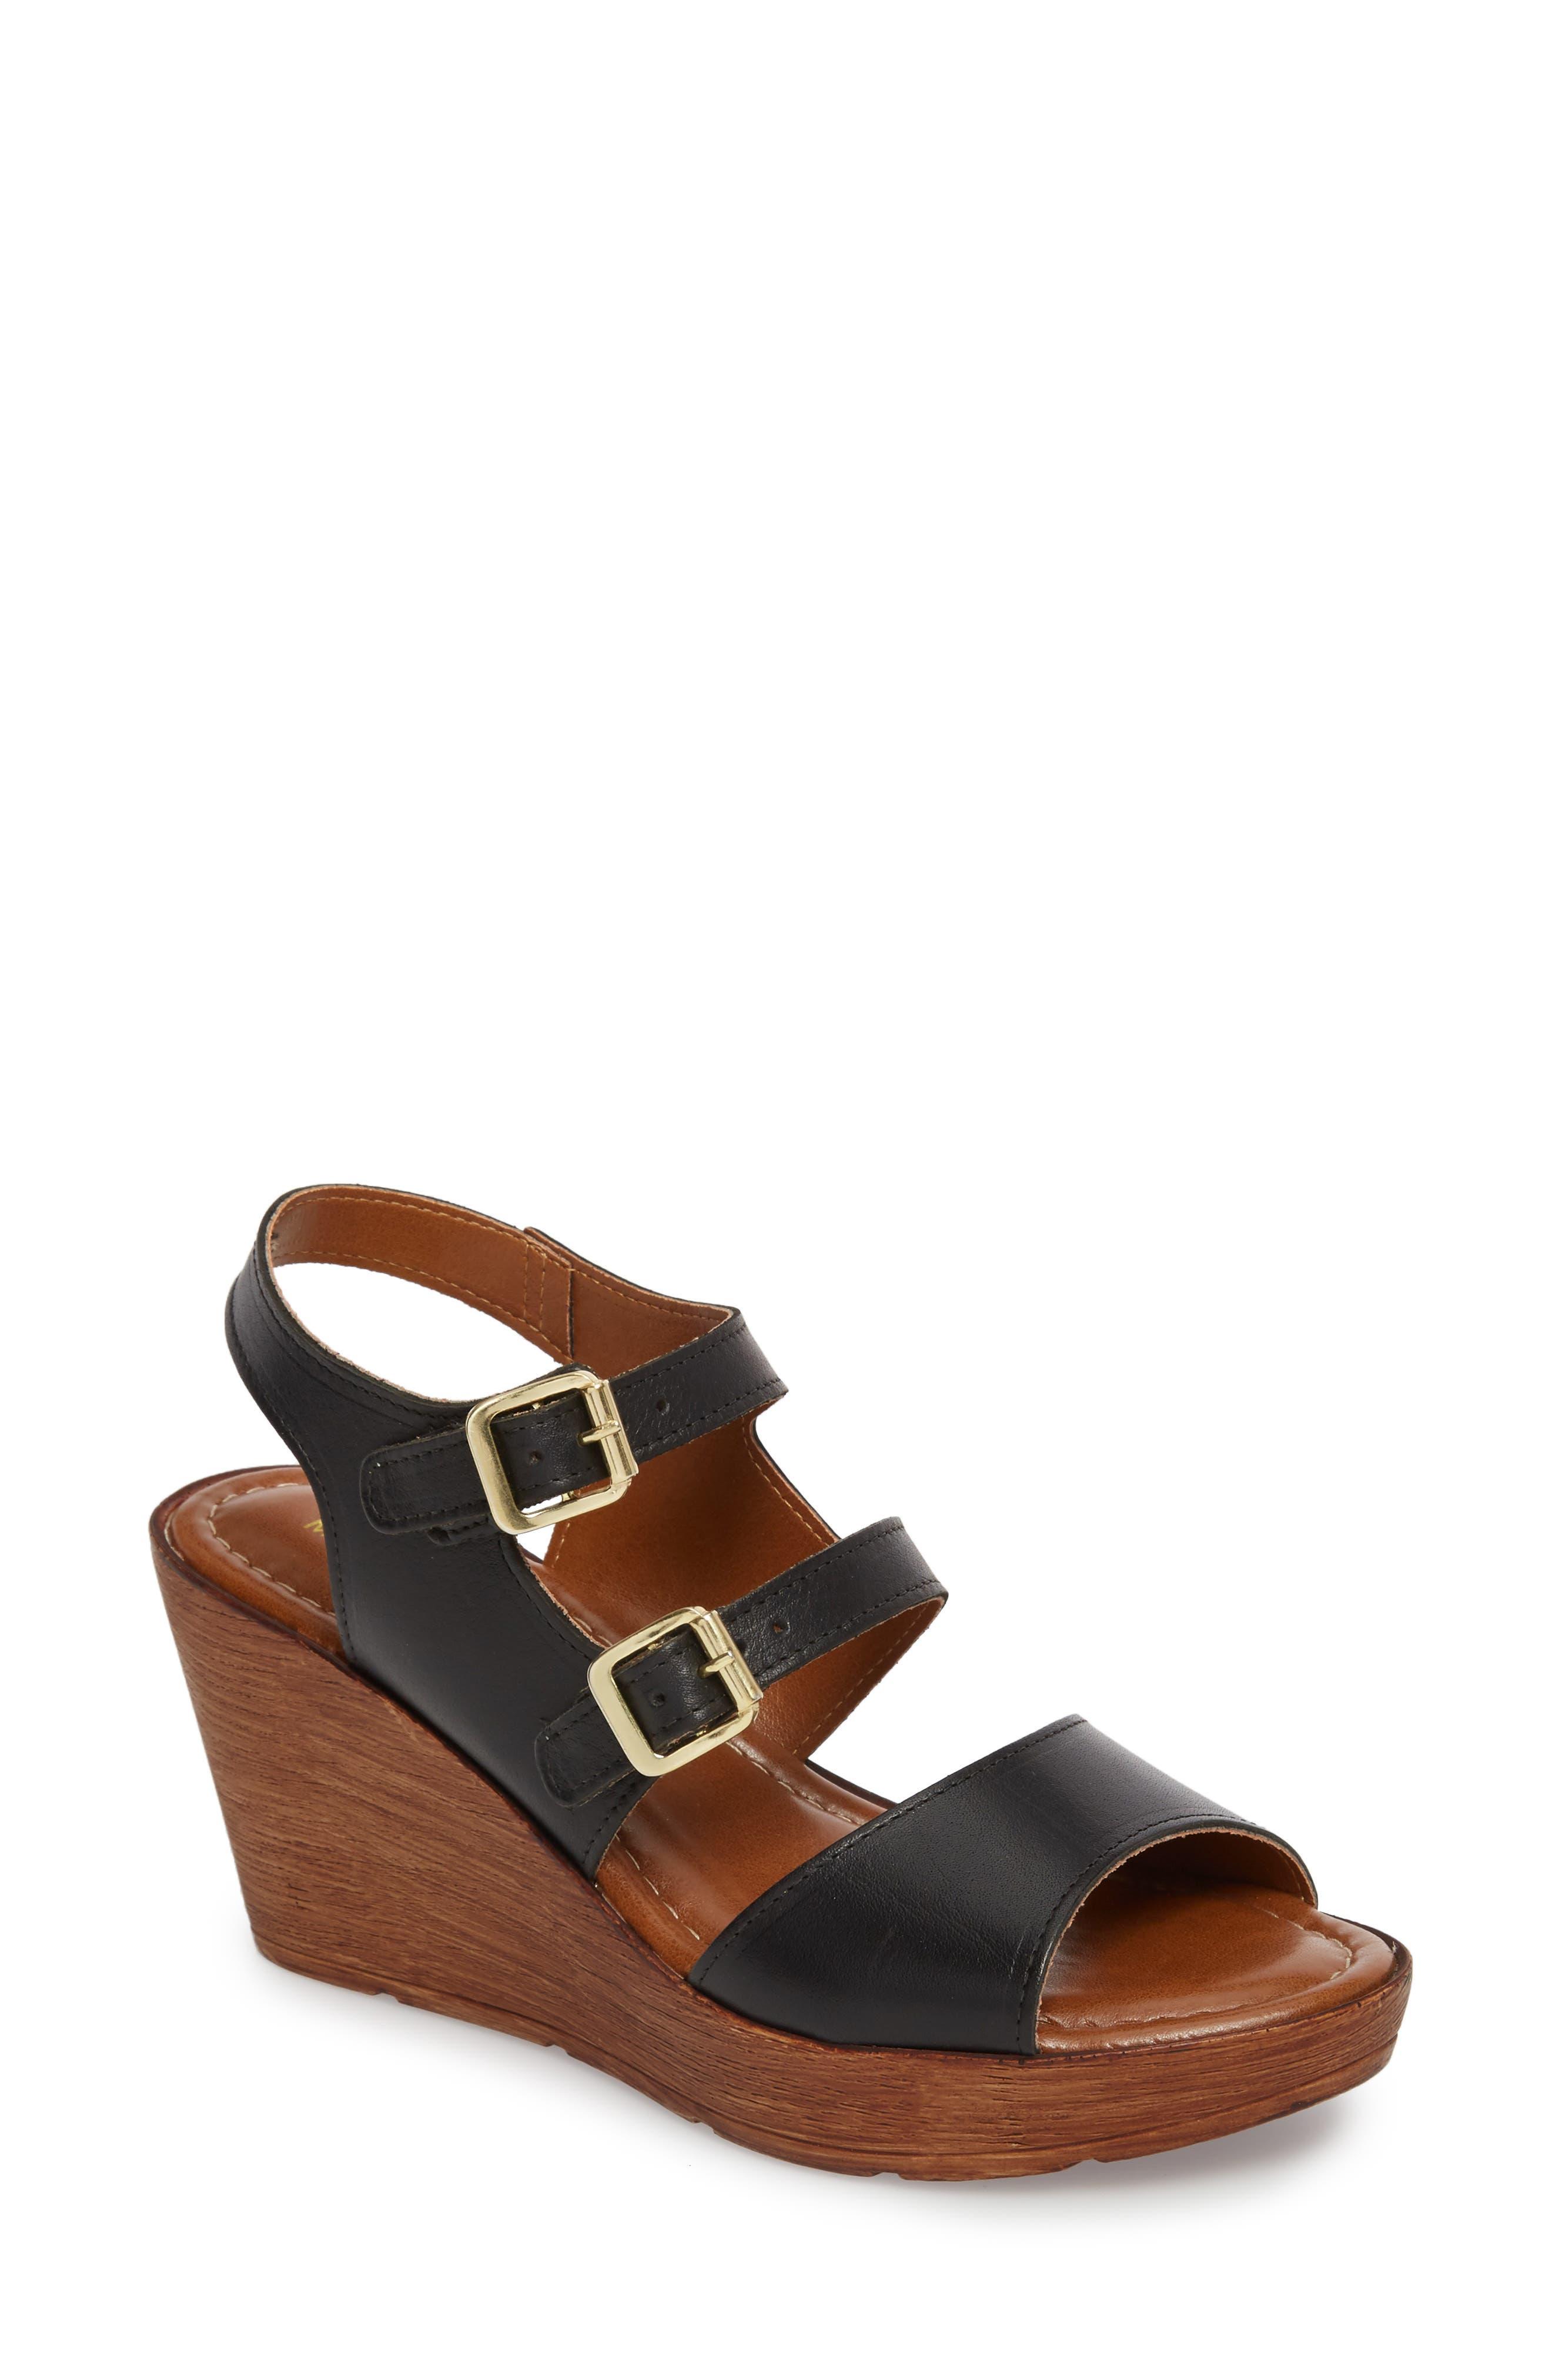 Ani Wedge Sandal,                         Main,                         color,